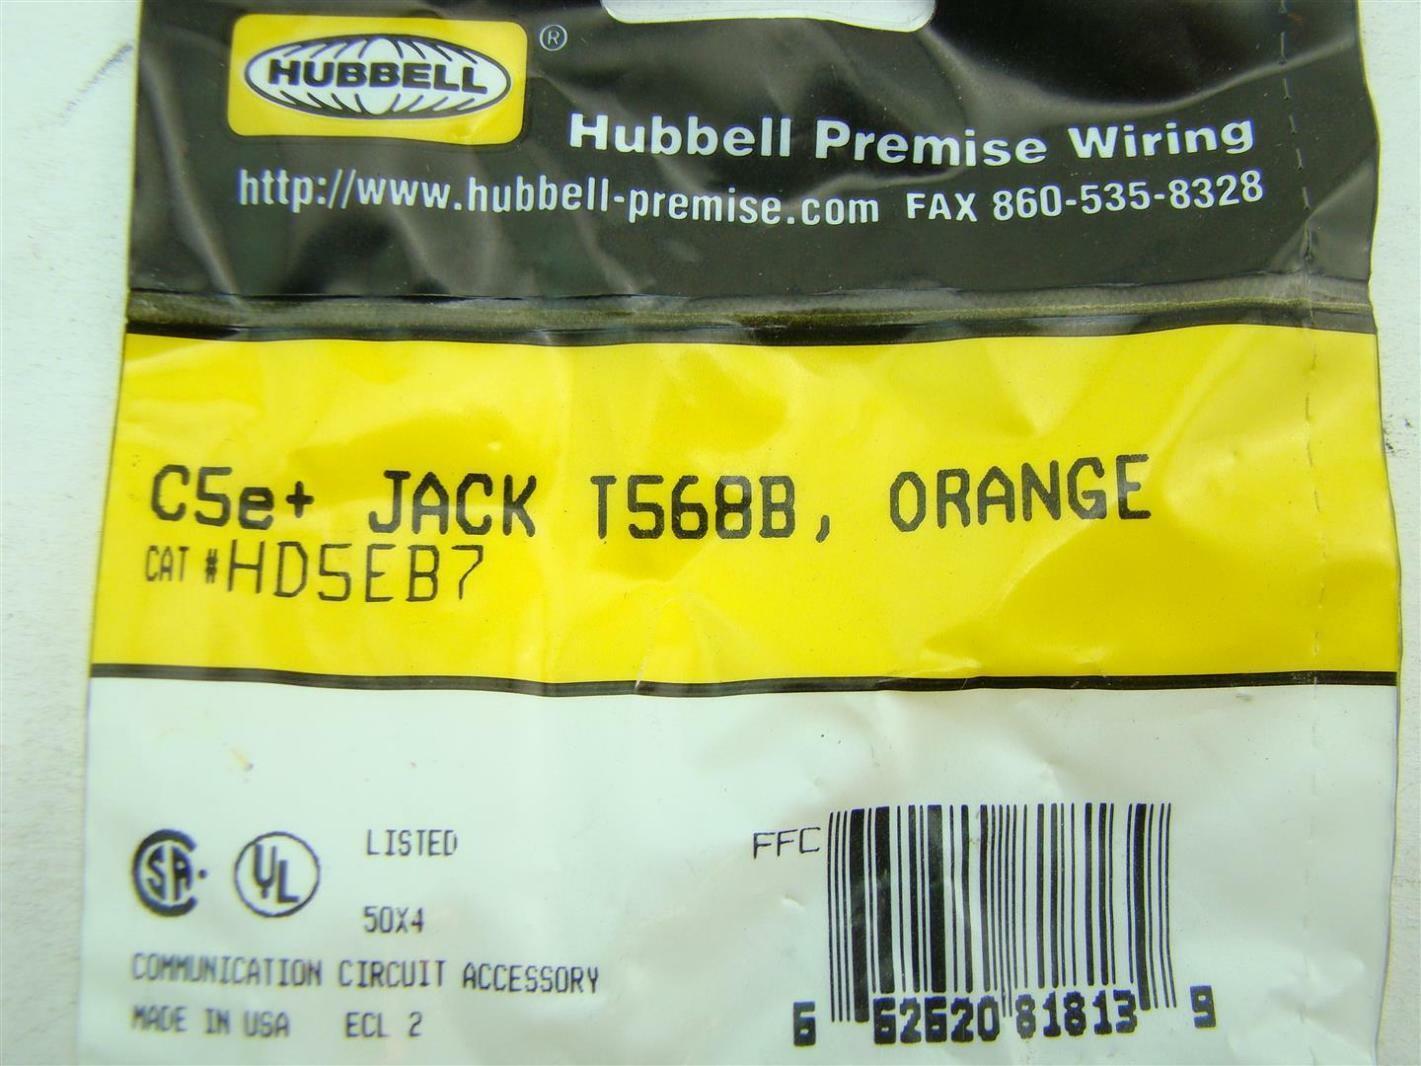 Groovy 13 Pcs Hubbell Premise Wiring Hd5Eb7 Joseph Fazzio Incorporated Wiring Database Gramgelartorg